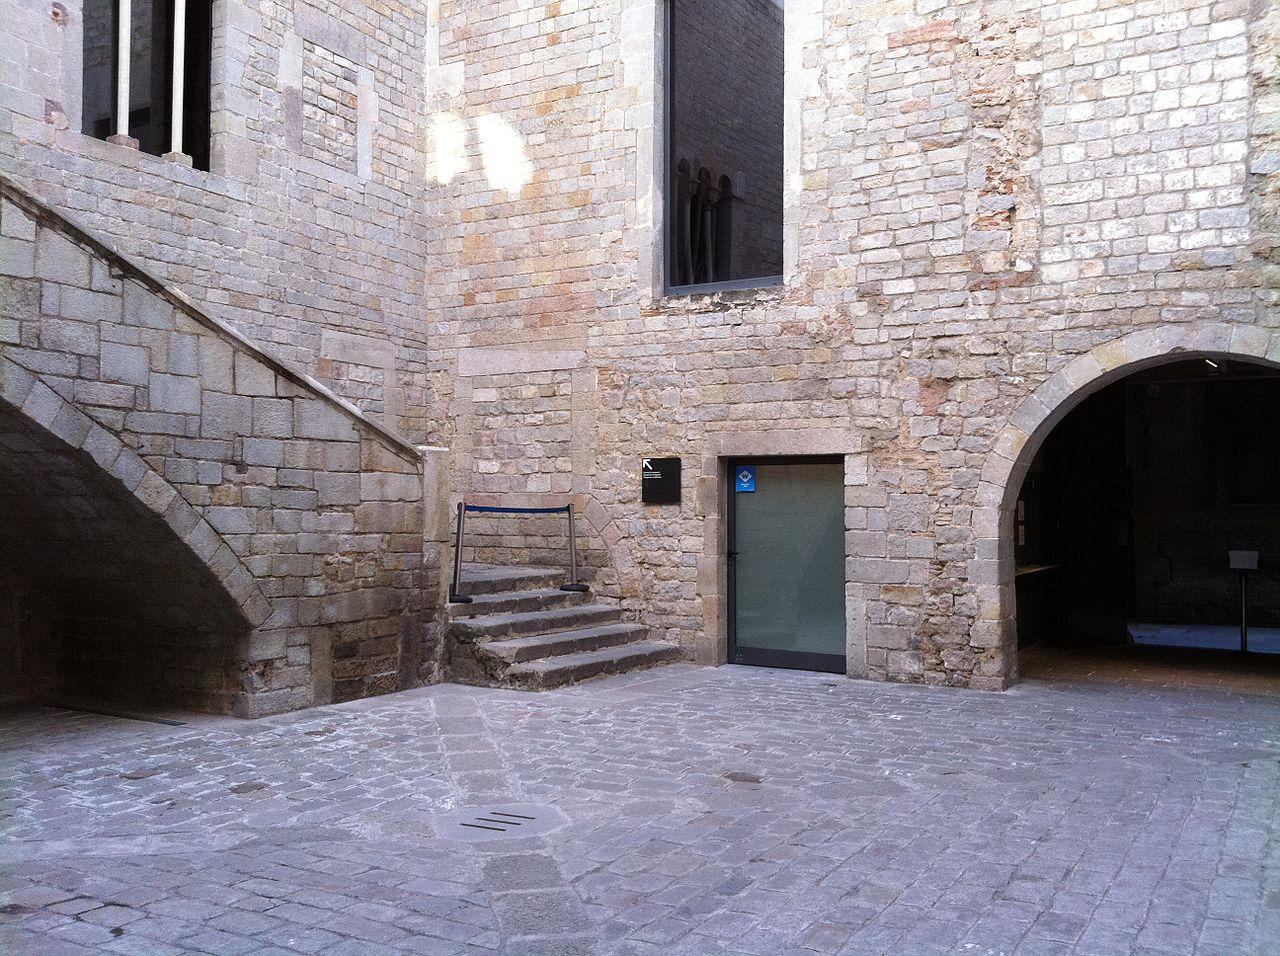 Музей Пикассо в Барселоне, патио